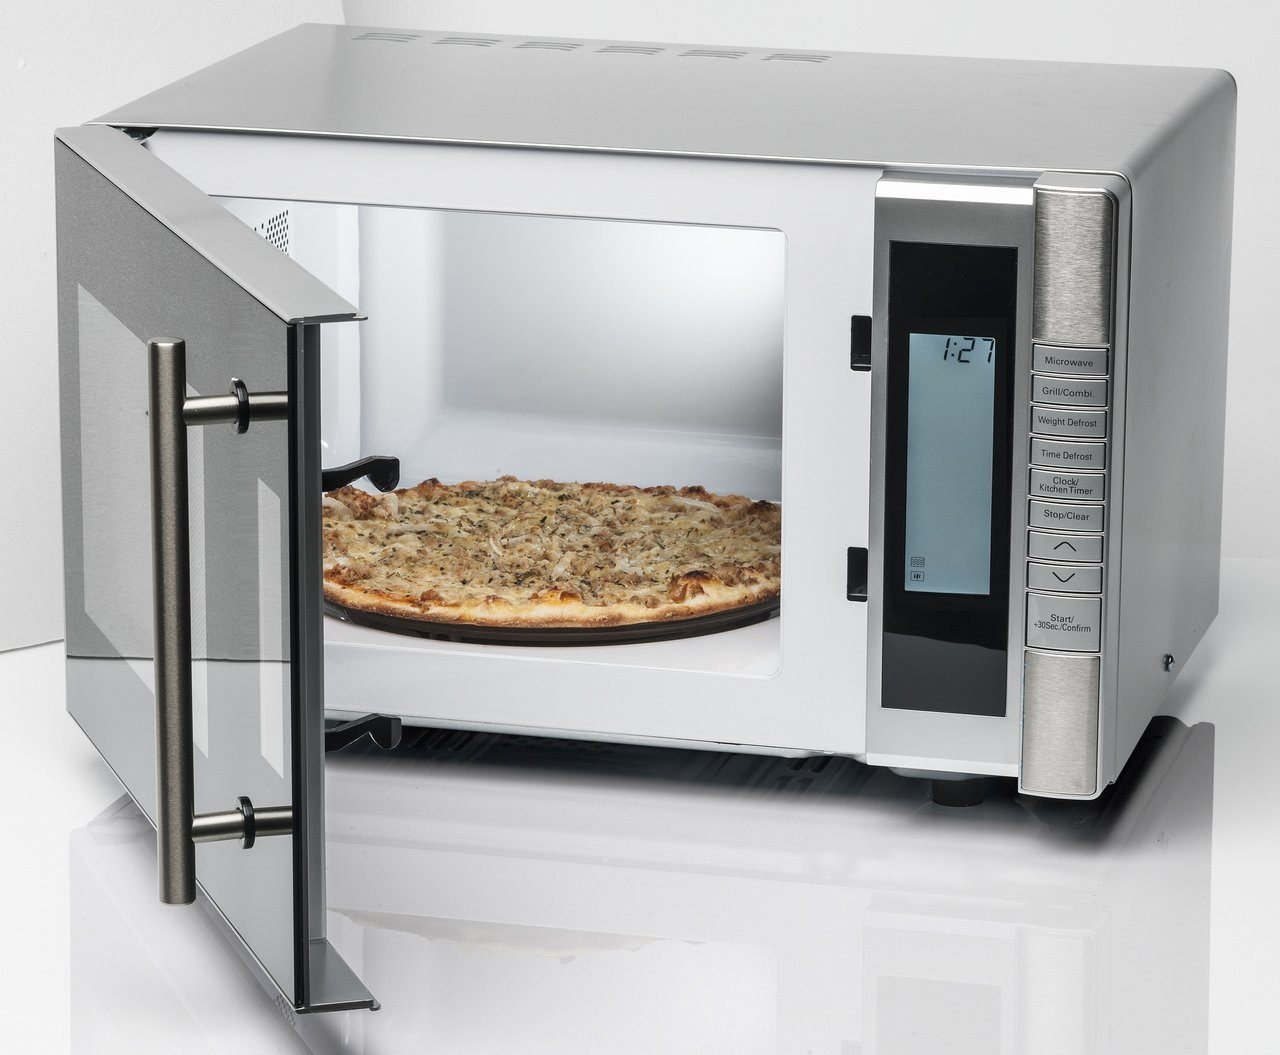 Aldi Kühlschrank Maße : Aldi mikrowellen expertentesten